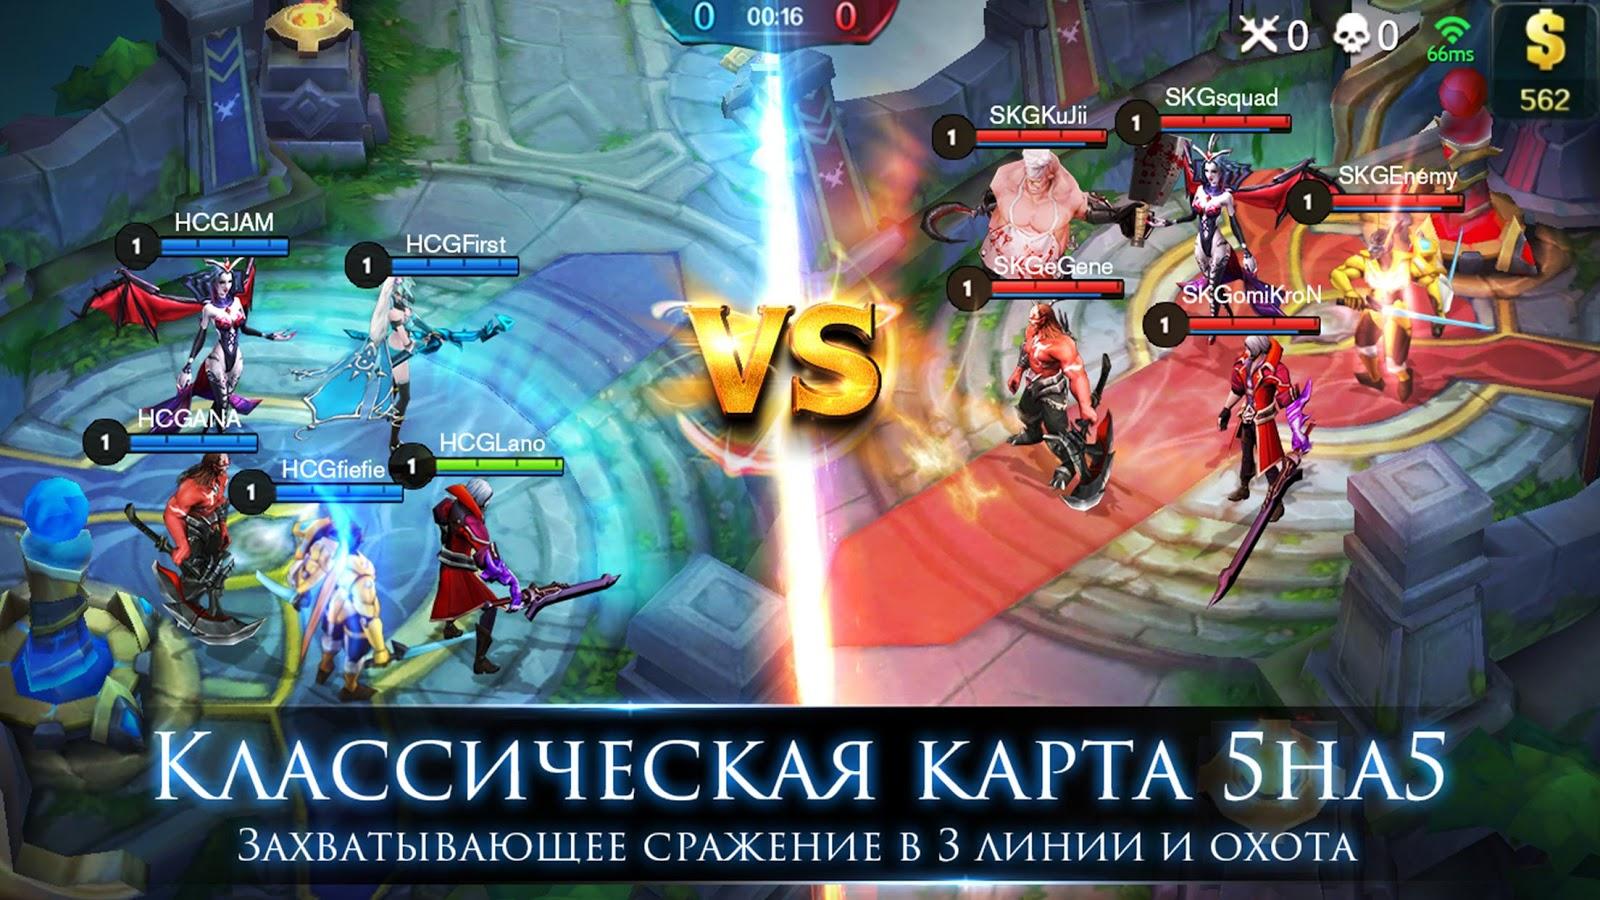 Описание Mobile Legends